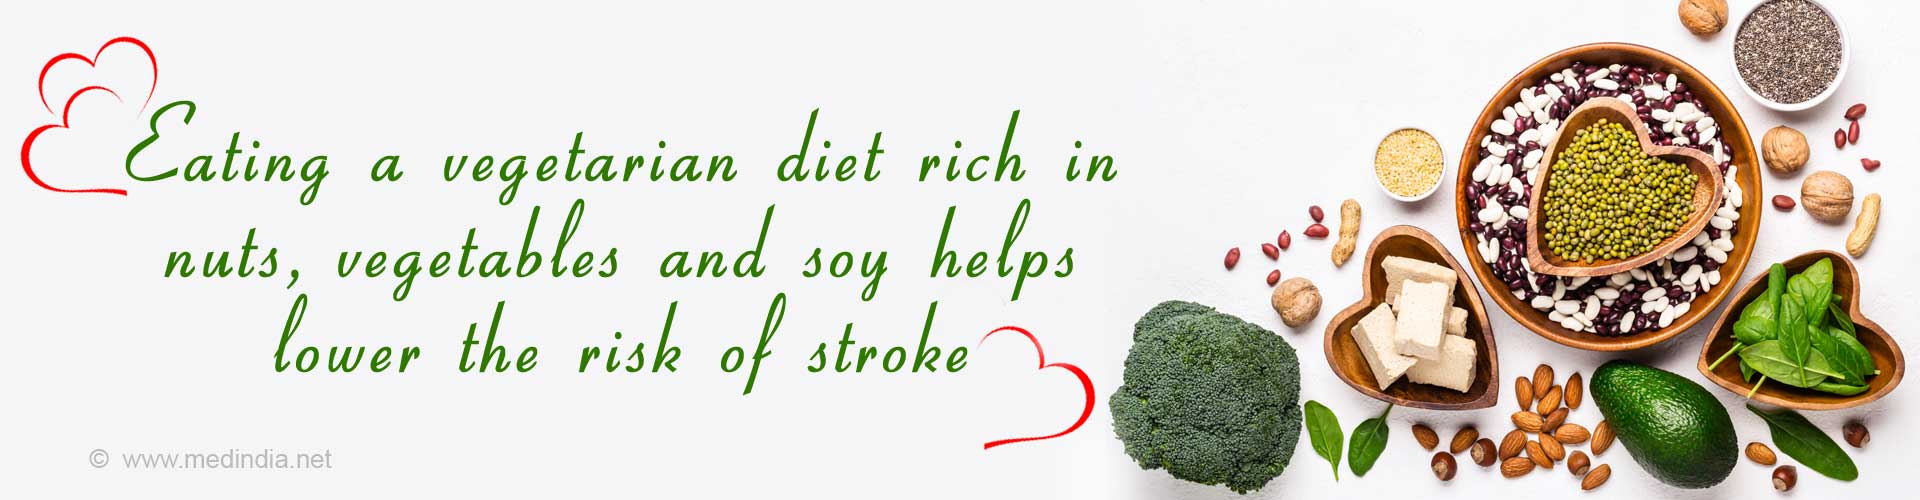 Vegetarian Diet Lowers Stroke Risk